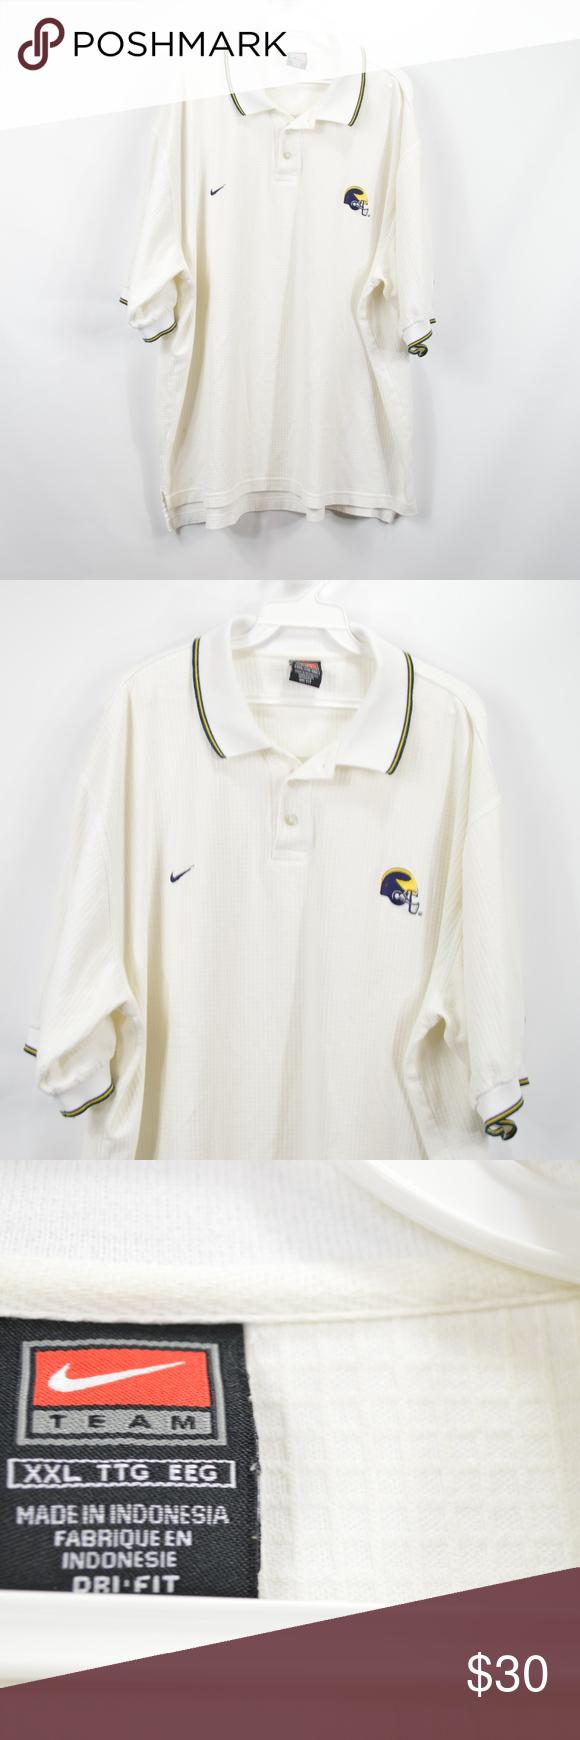 Vintage Nike Mens Michigan Wolverines Golf Shirt Vintage Nike Golf Shirts Nike Men